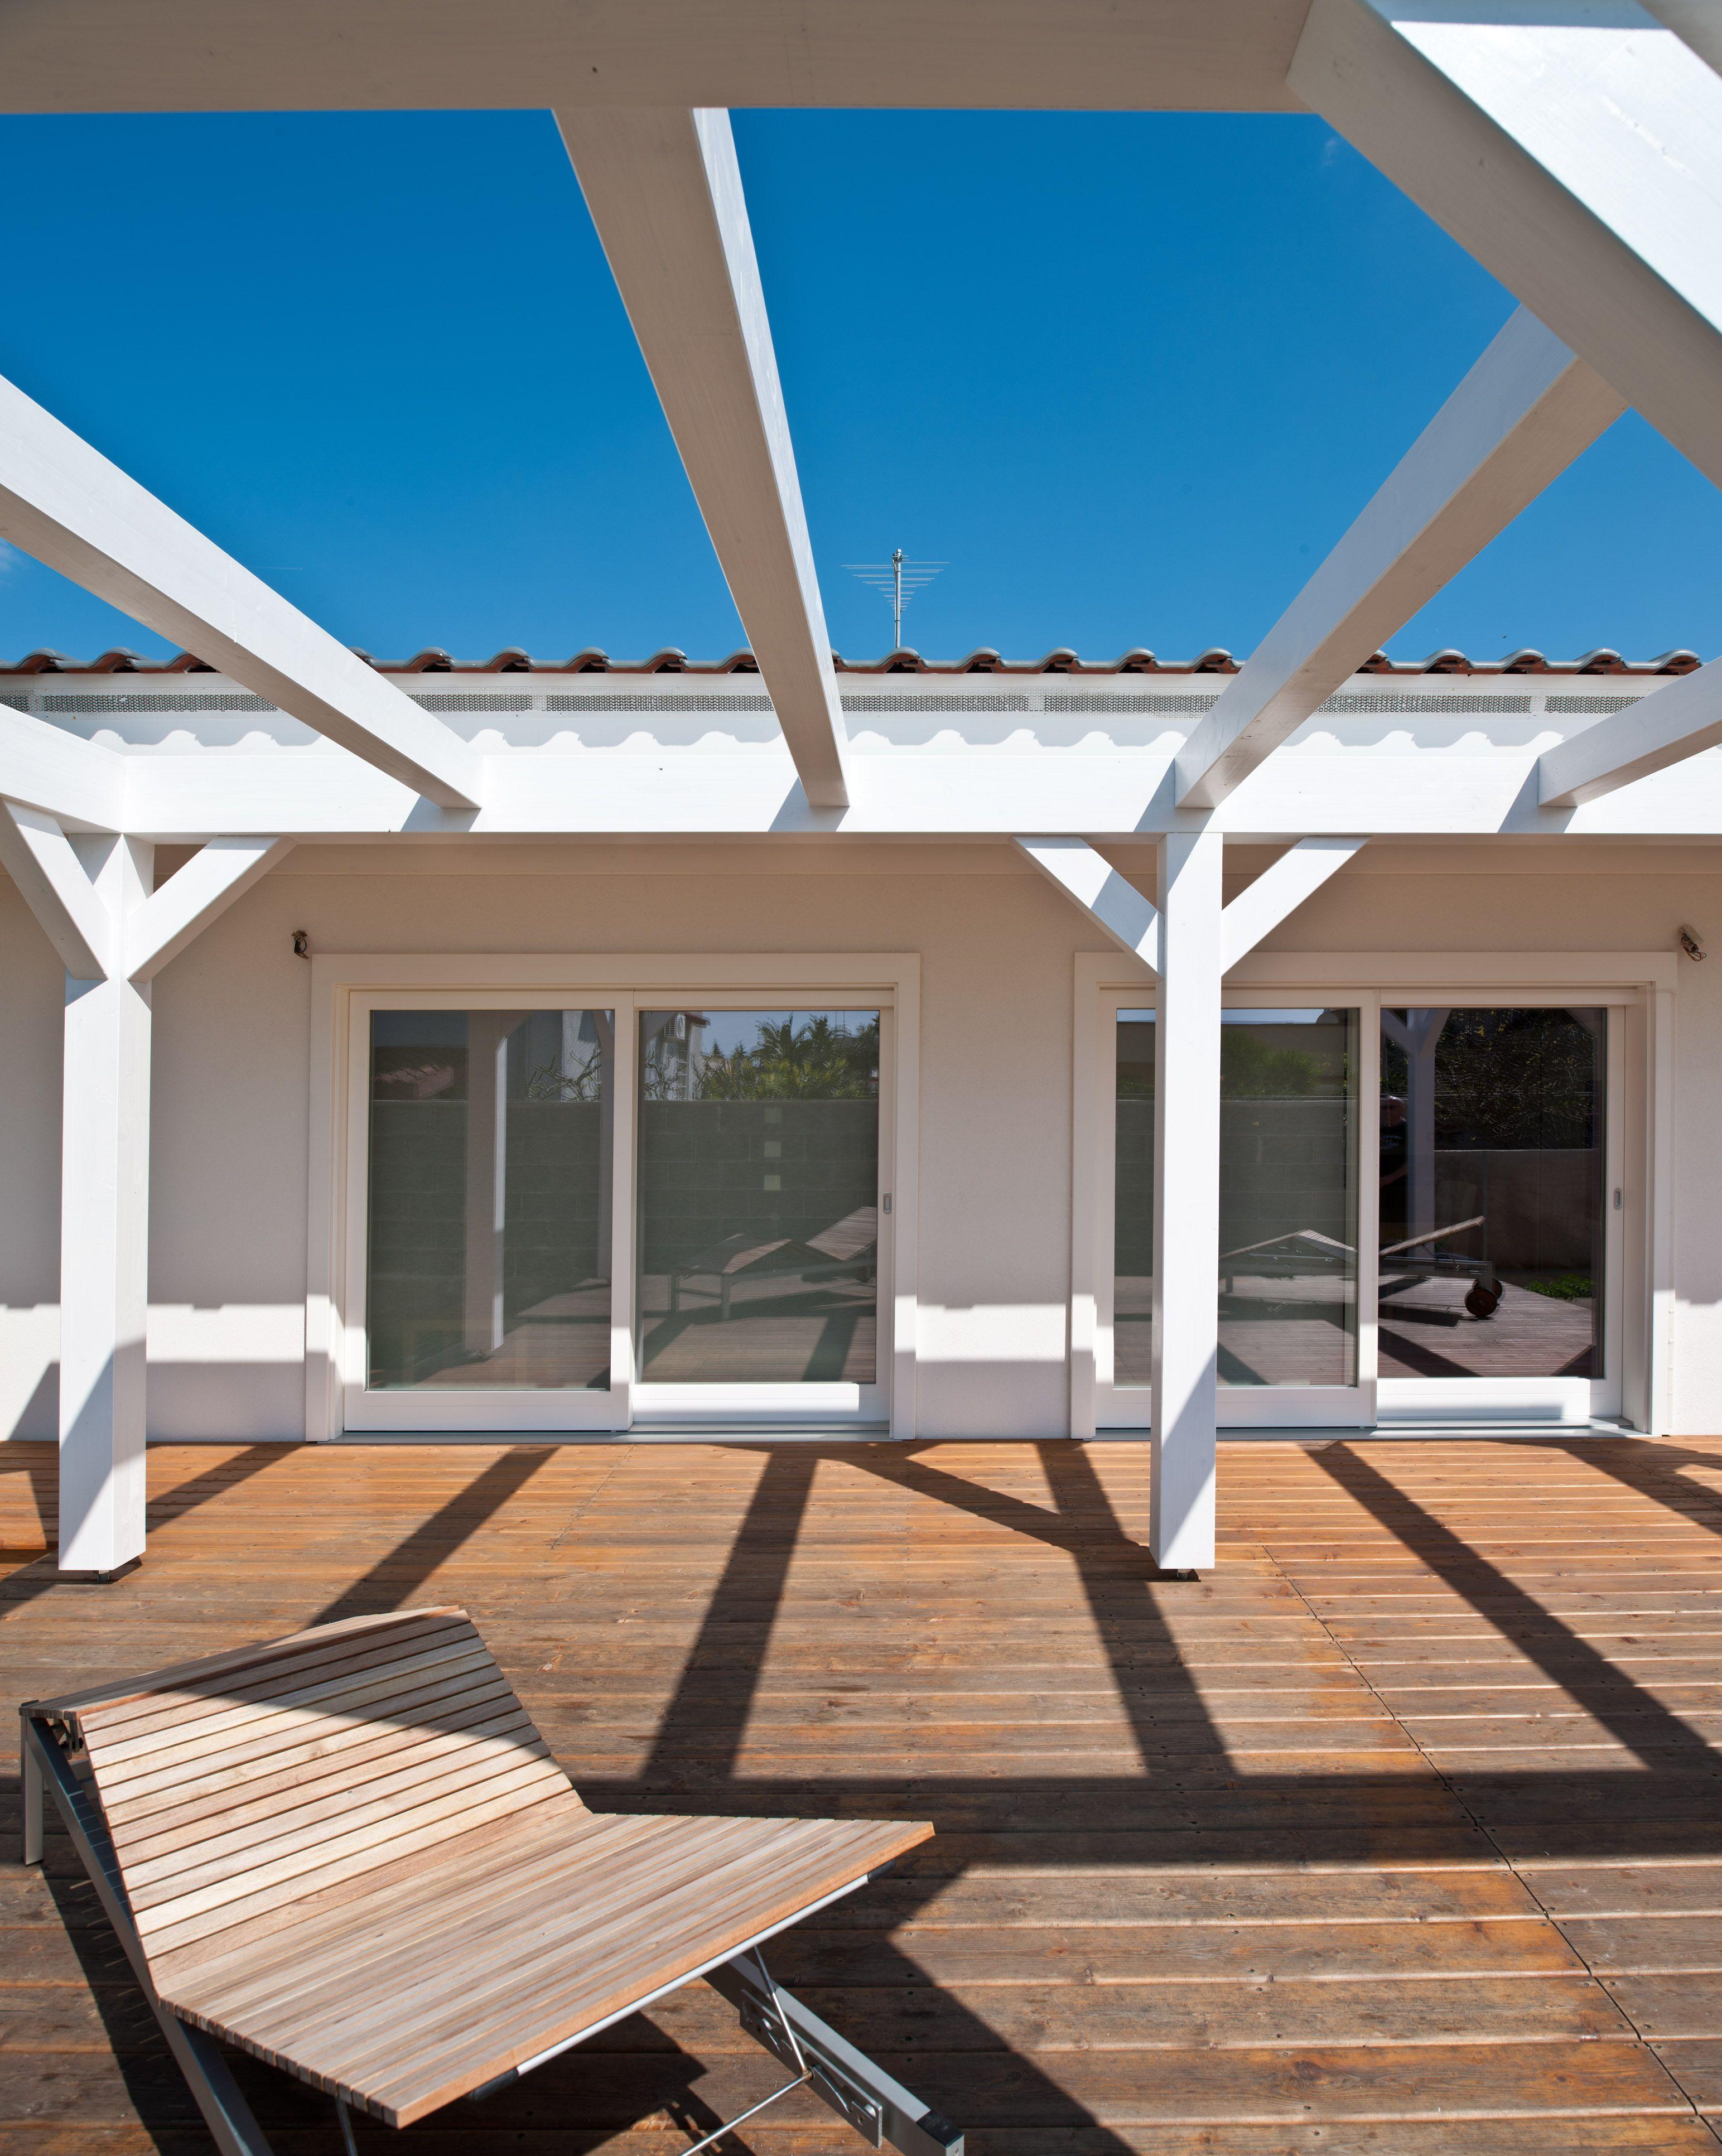 Rubner Haus   Outdoor design   Pinterest